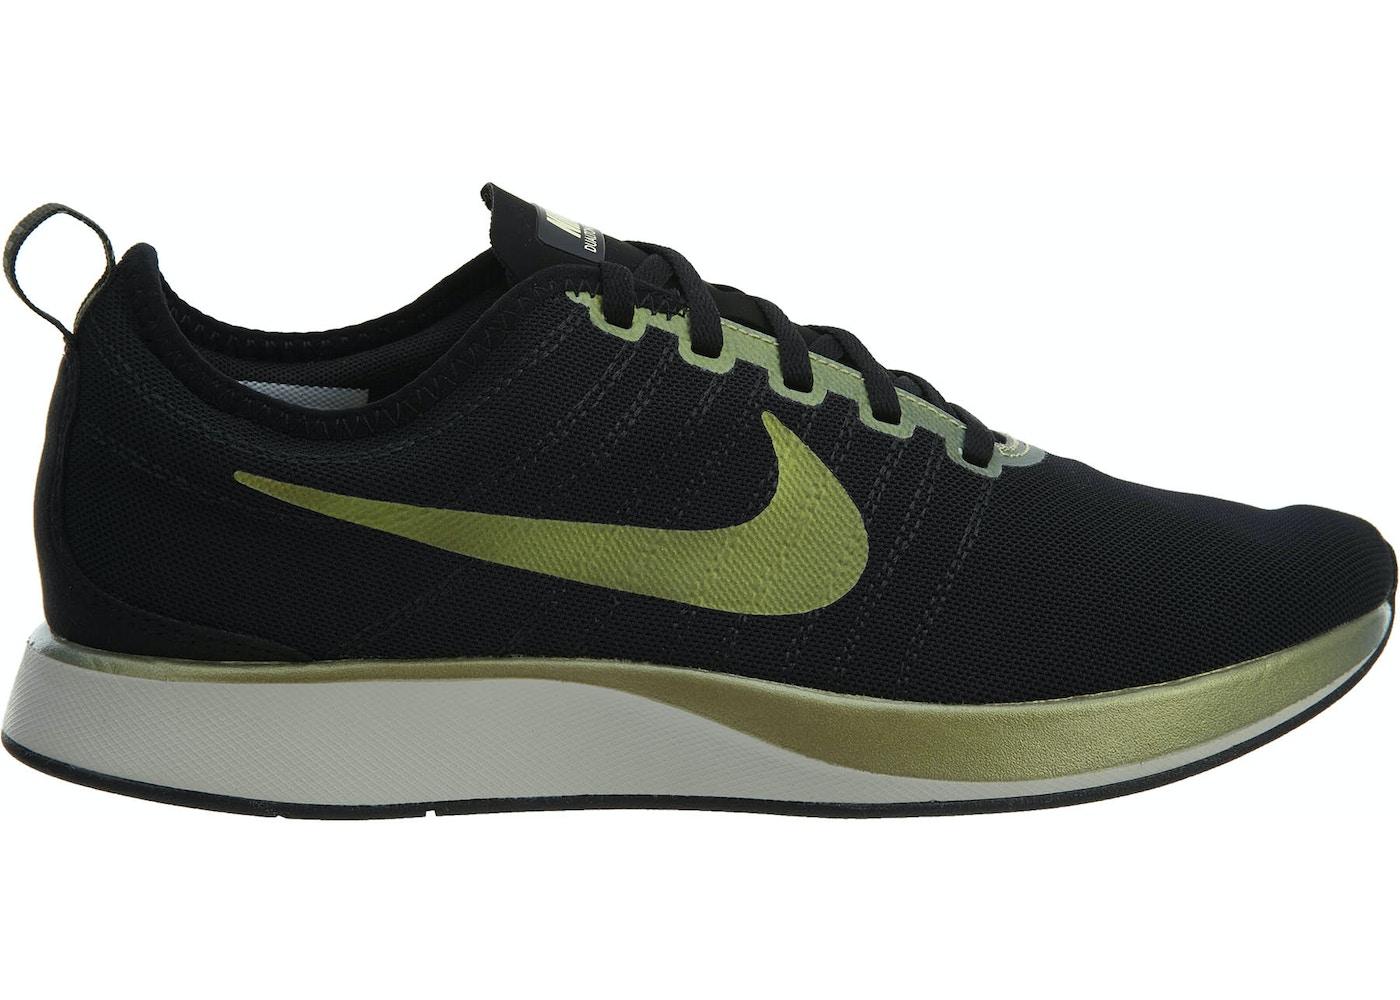 2f17c188fd8 Sell. or Ask. Size  8.5. View All Bids. Nike Dualtone Racer Se Black Black-Medium  Olive